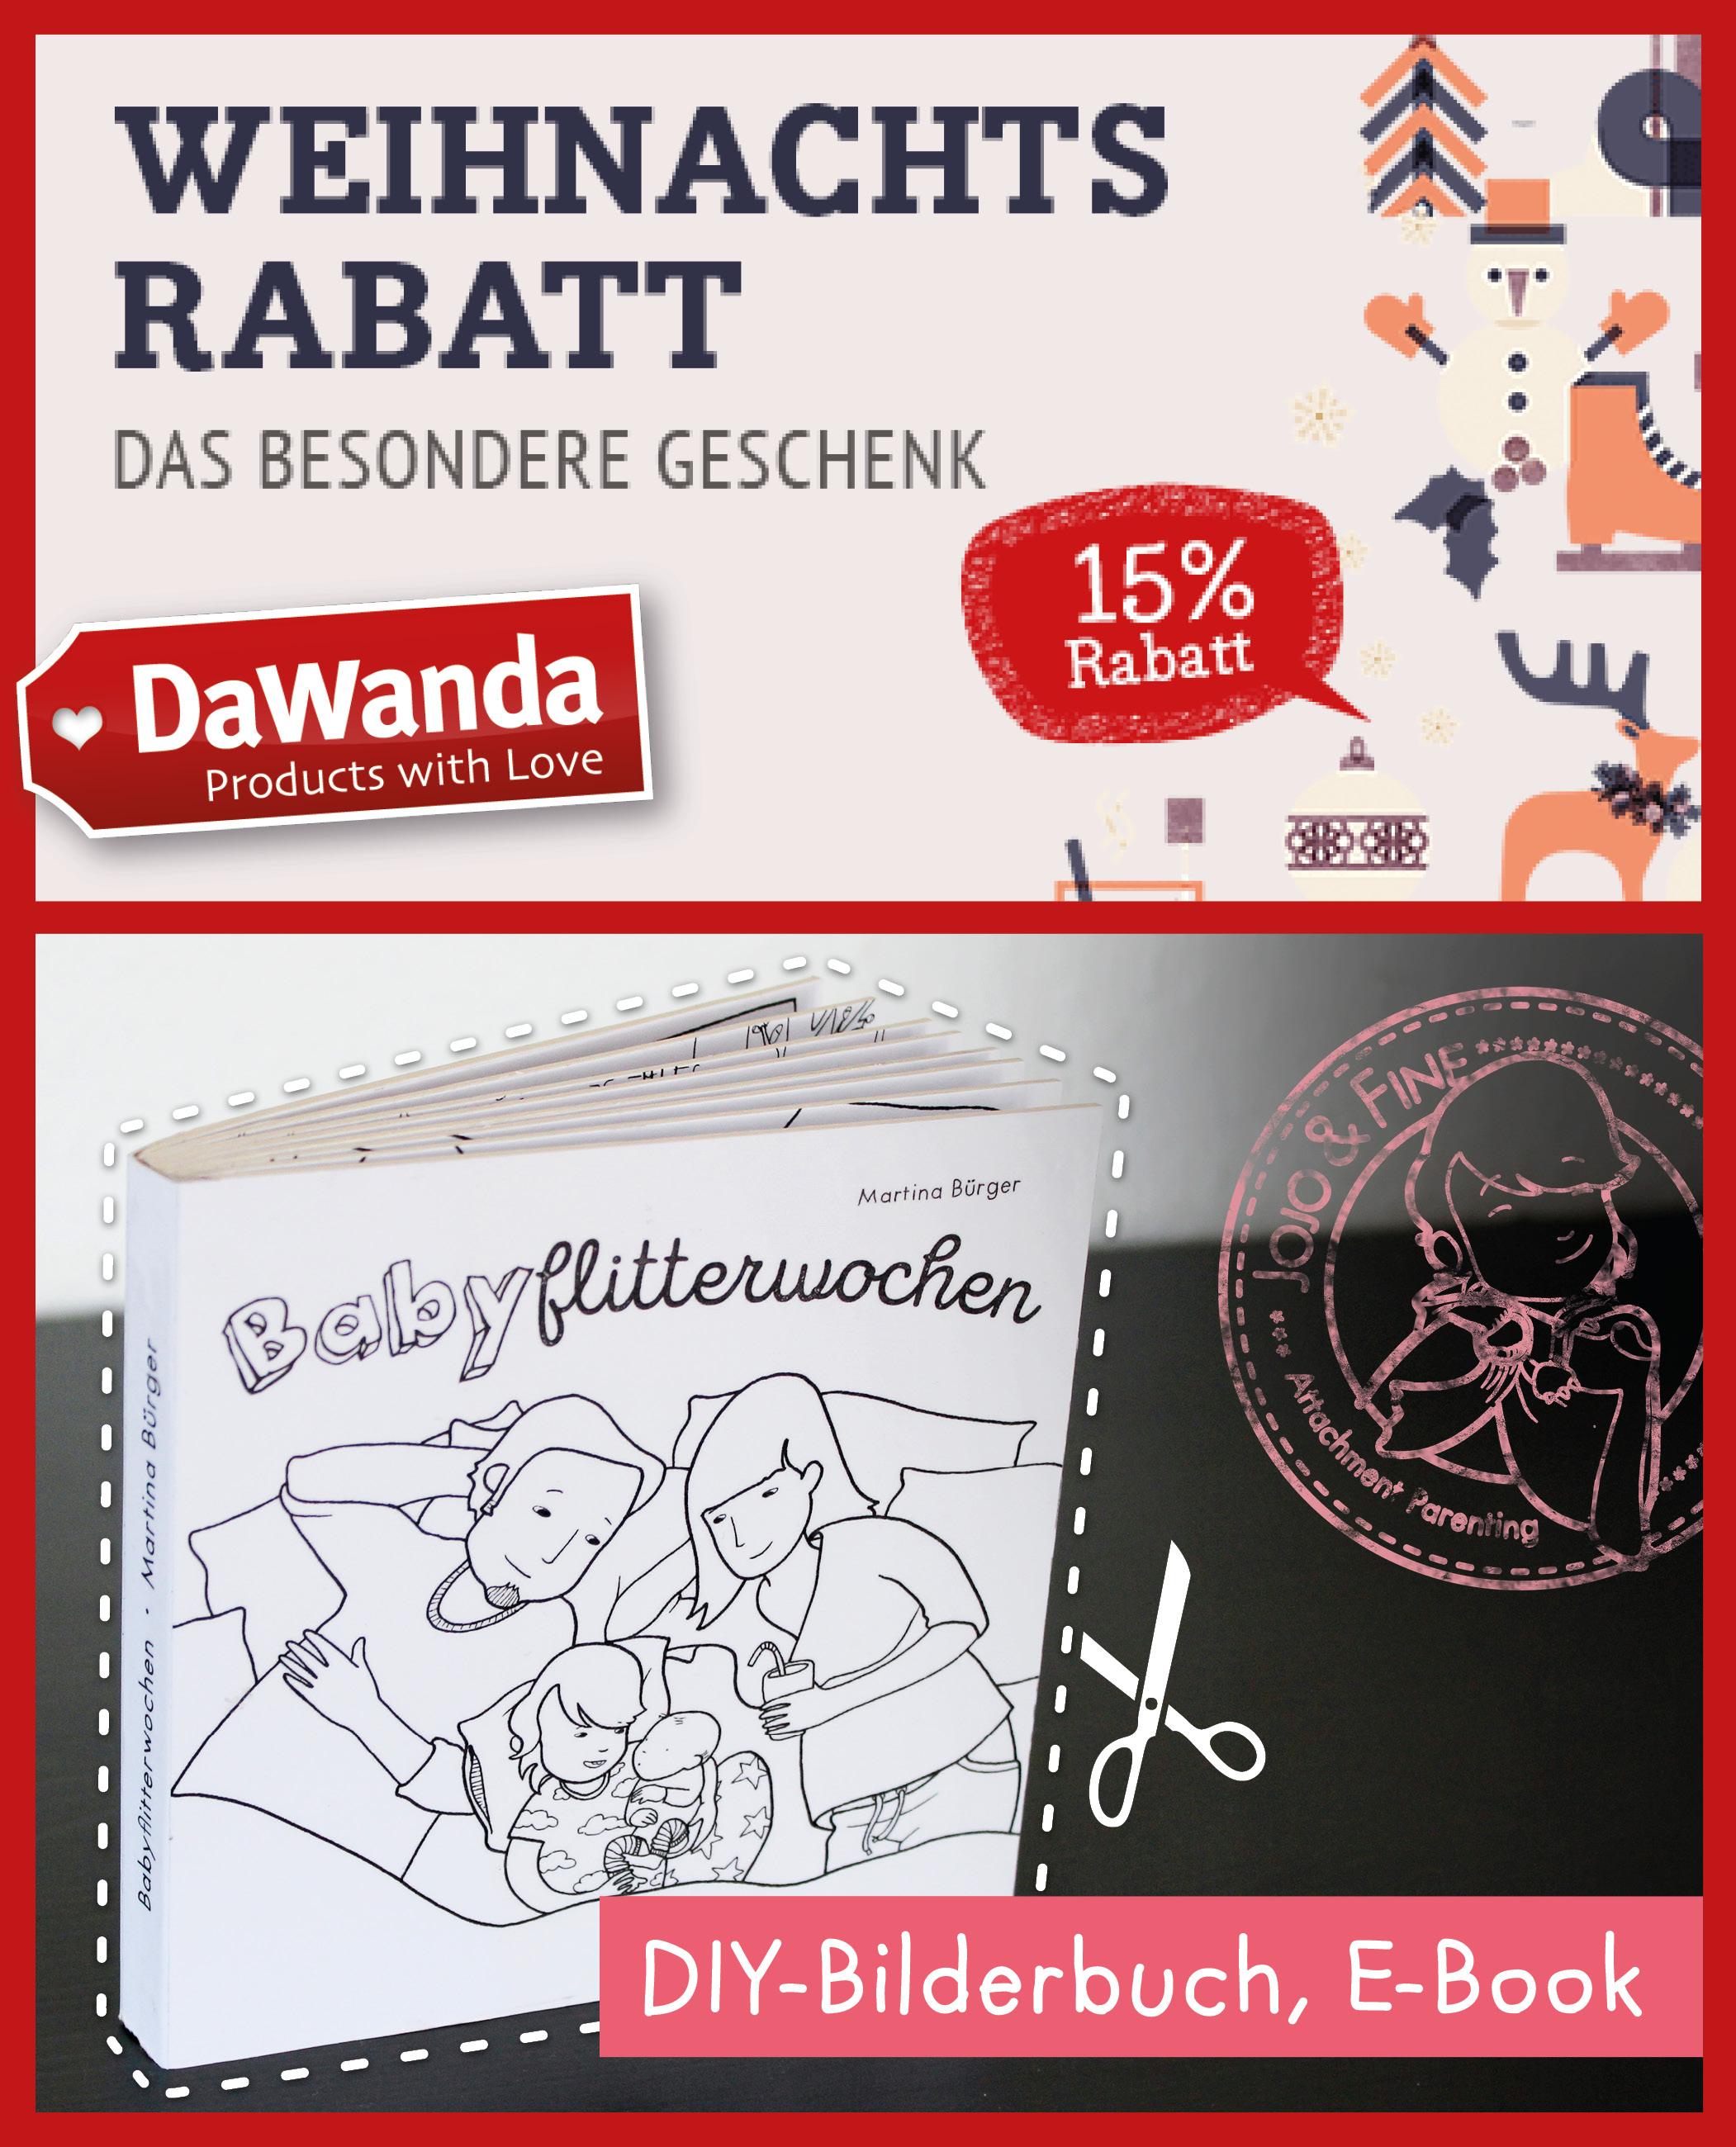 2015-11-24_Dawanda-Rabatt15